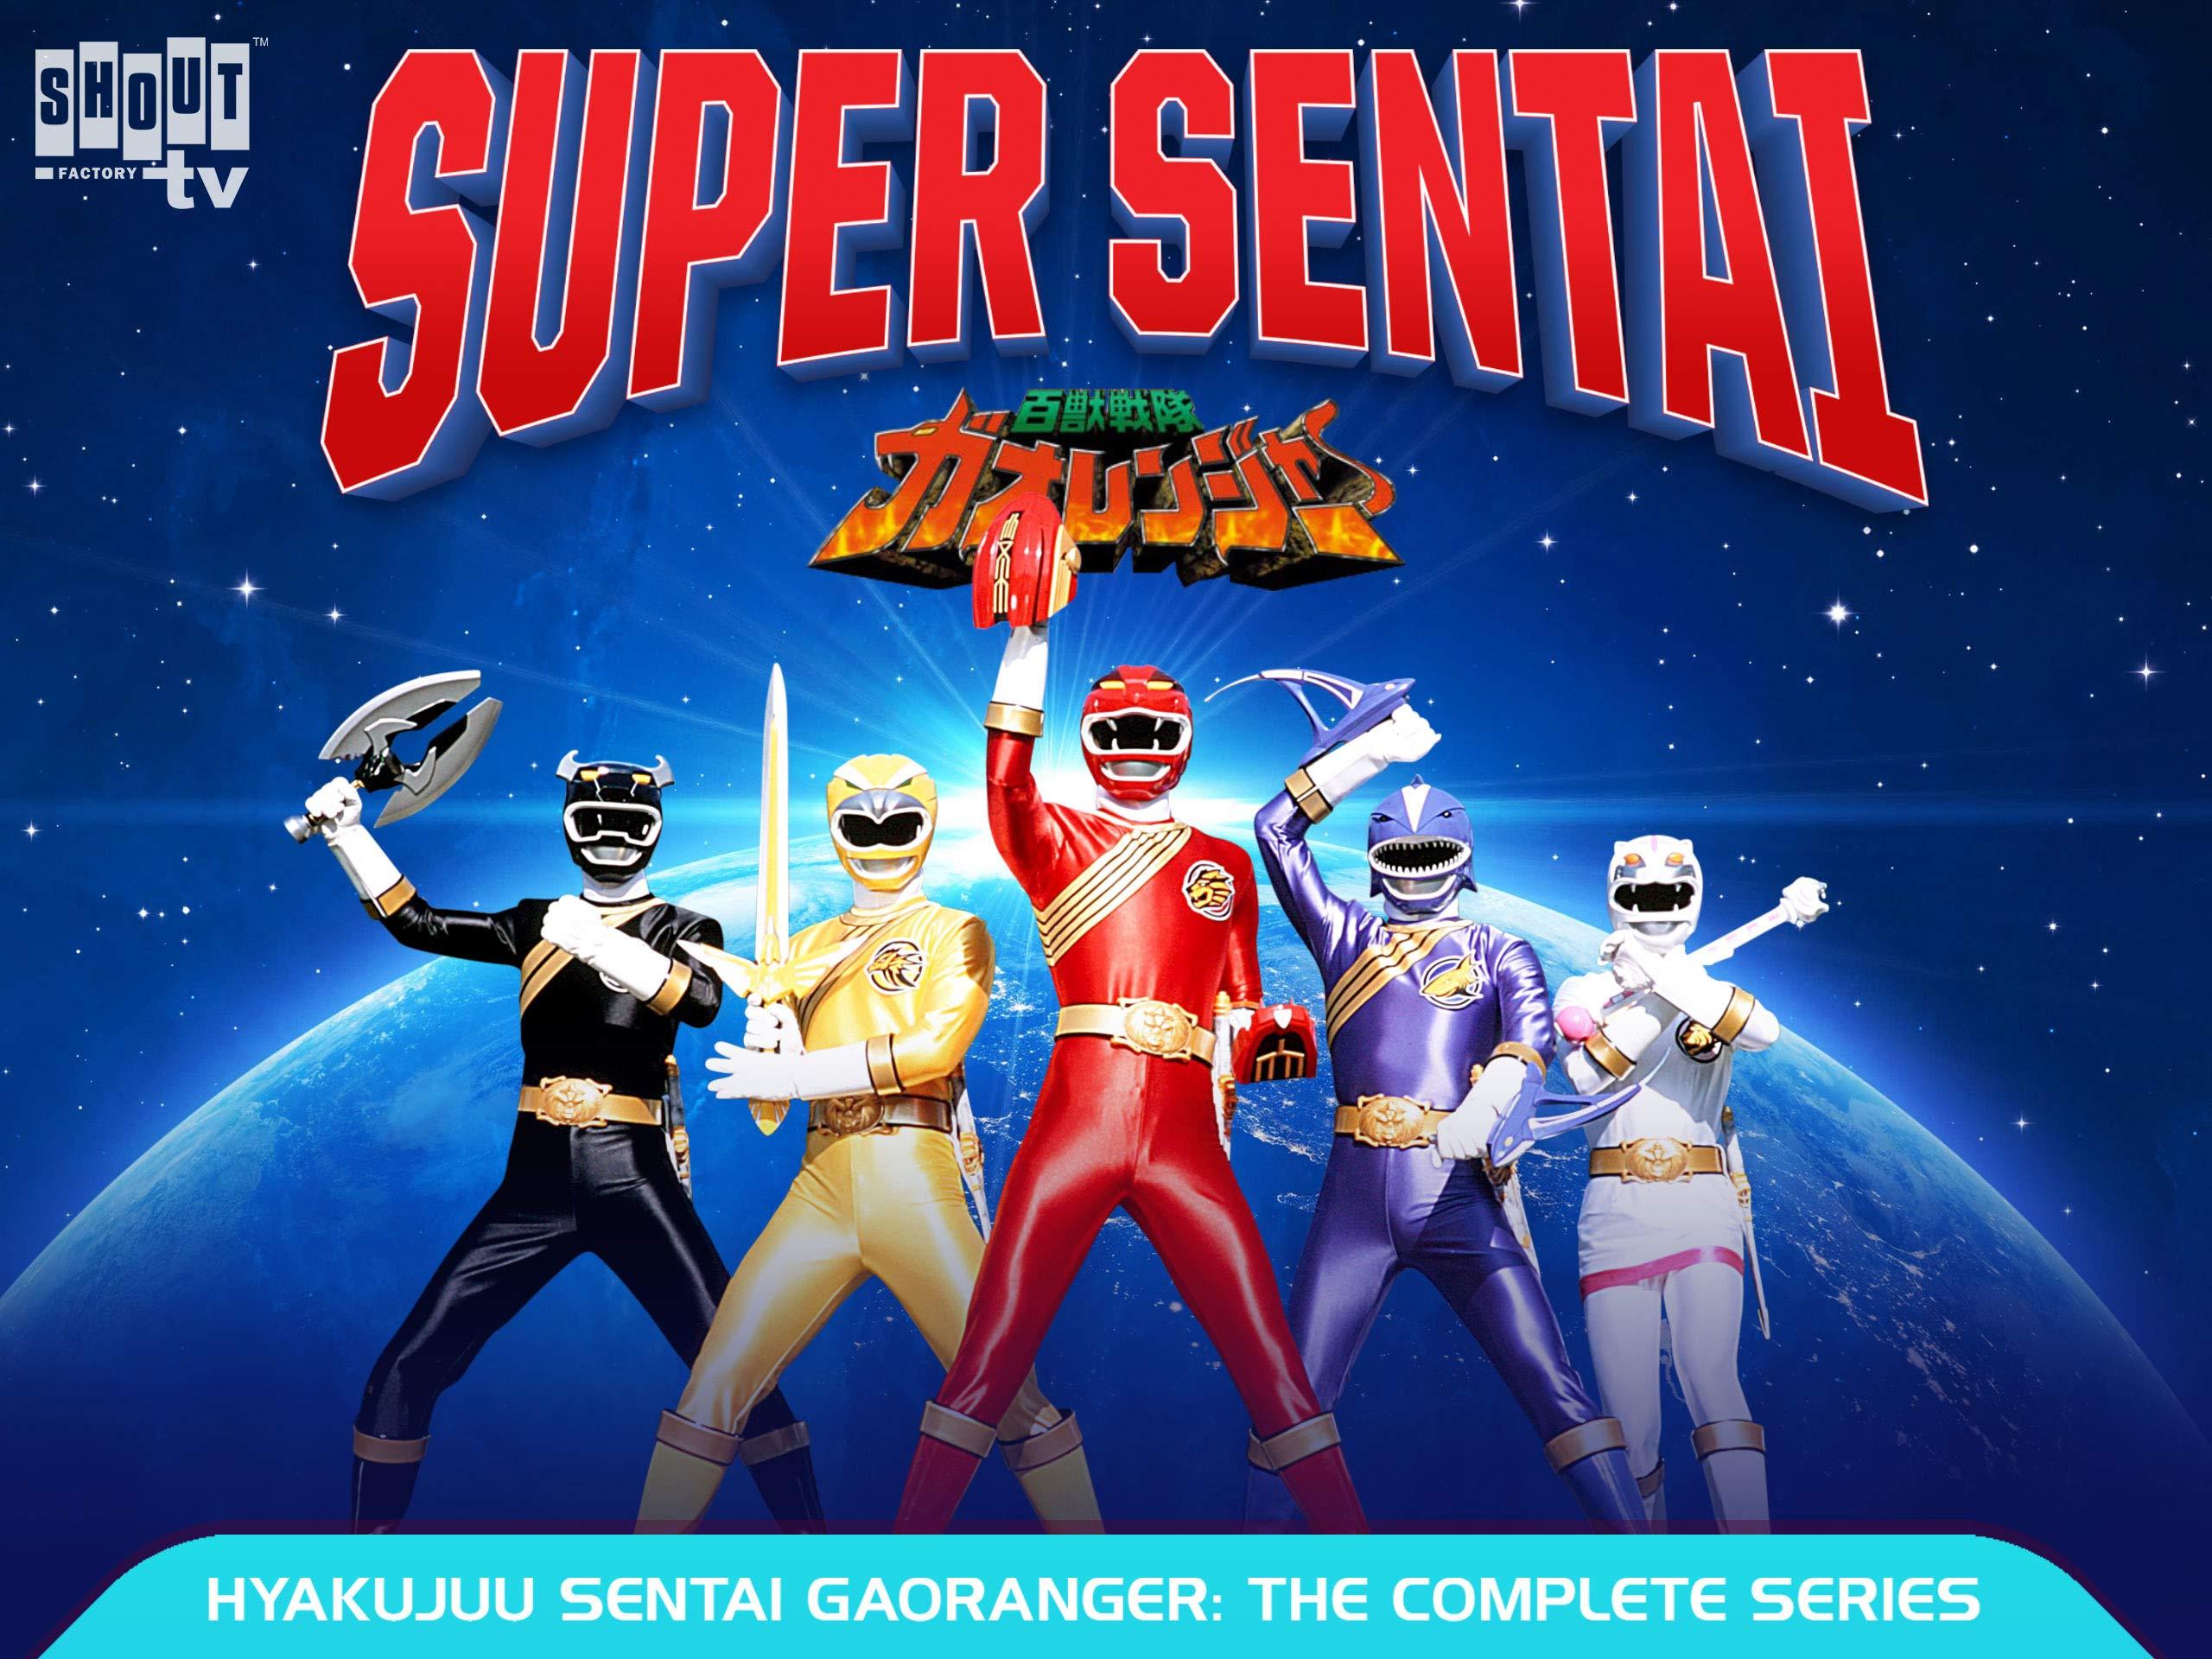 Amazon.com: Hyakujuu Sentai Gaoranger: Season One